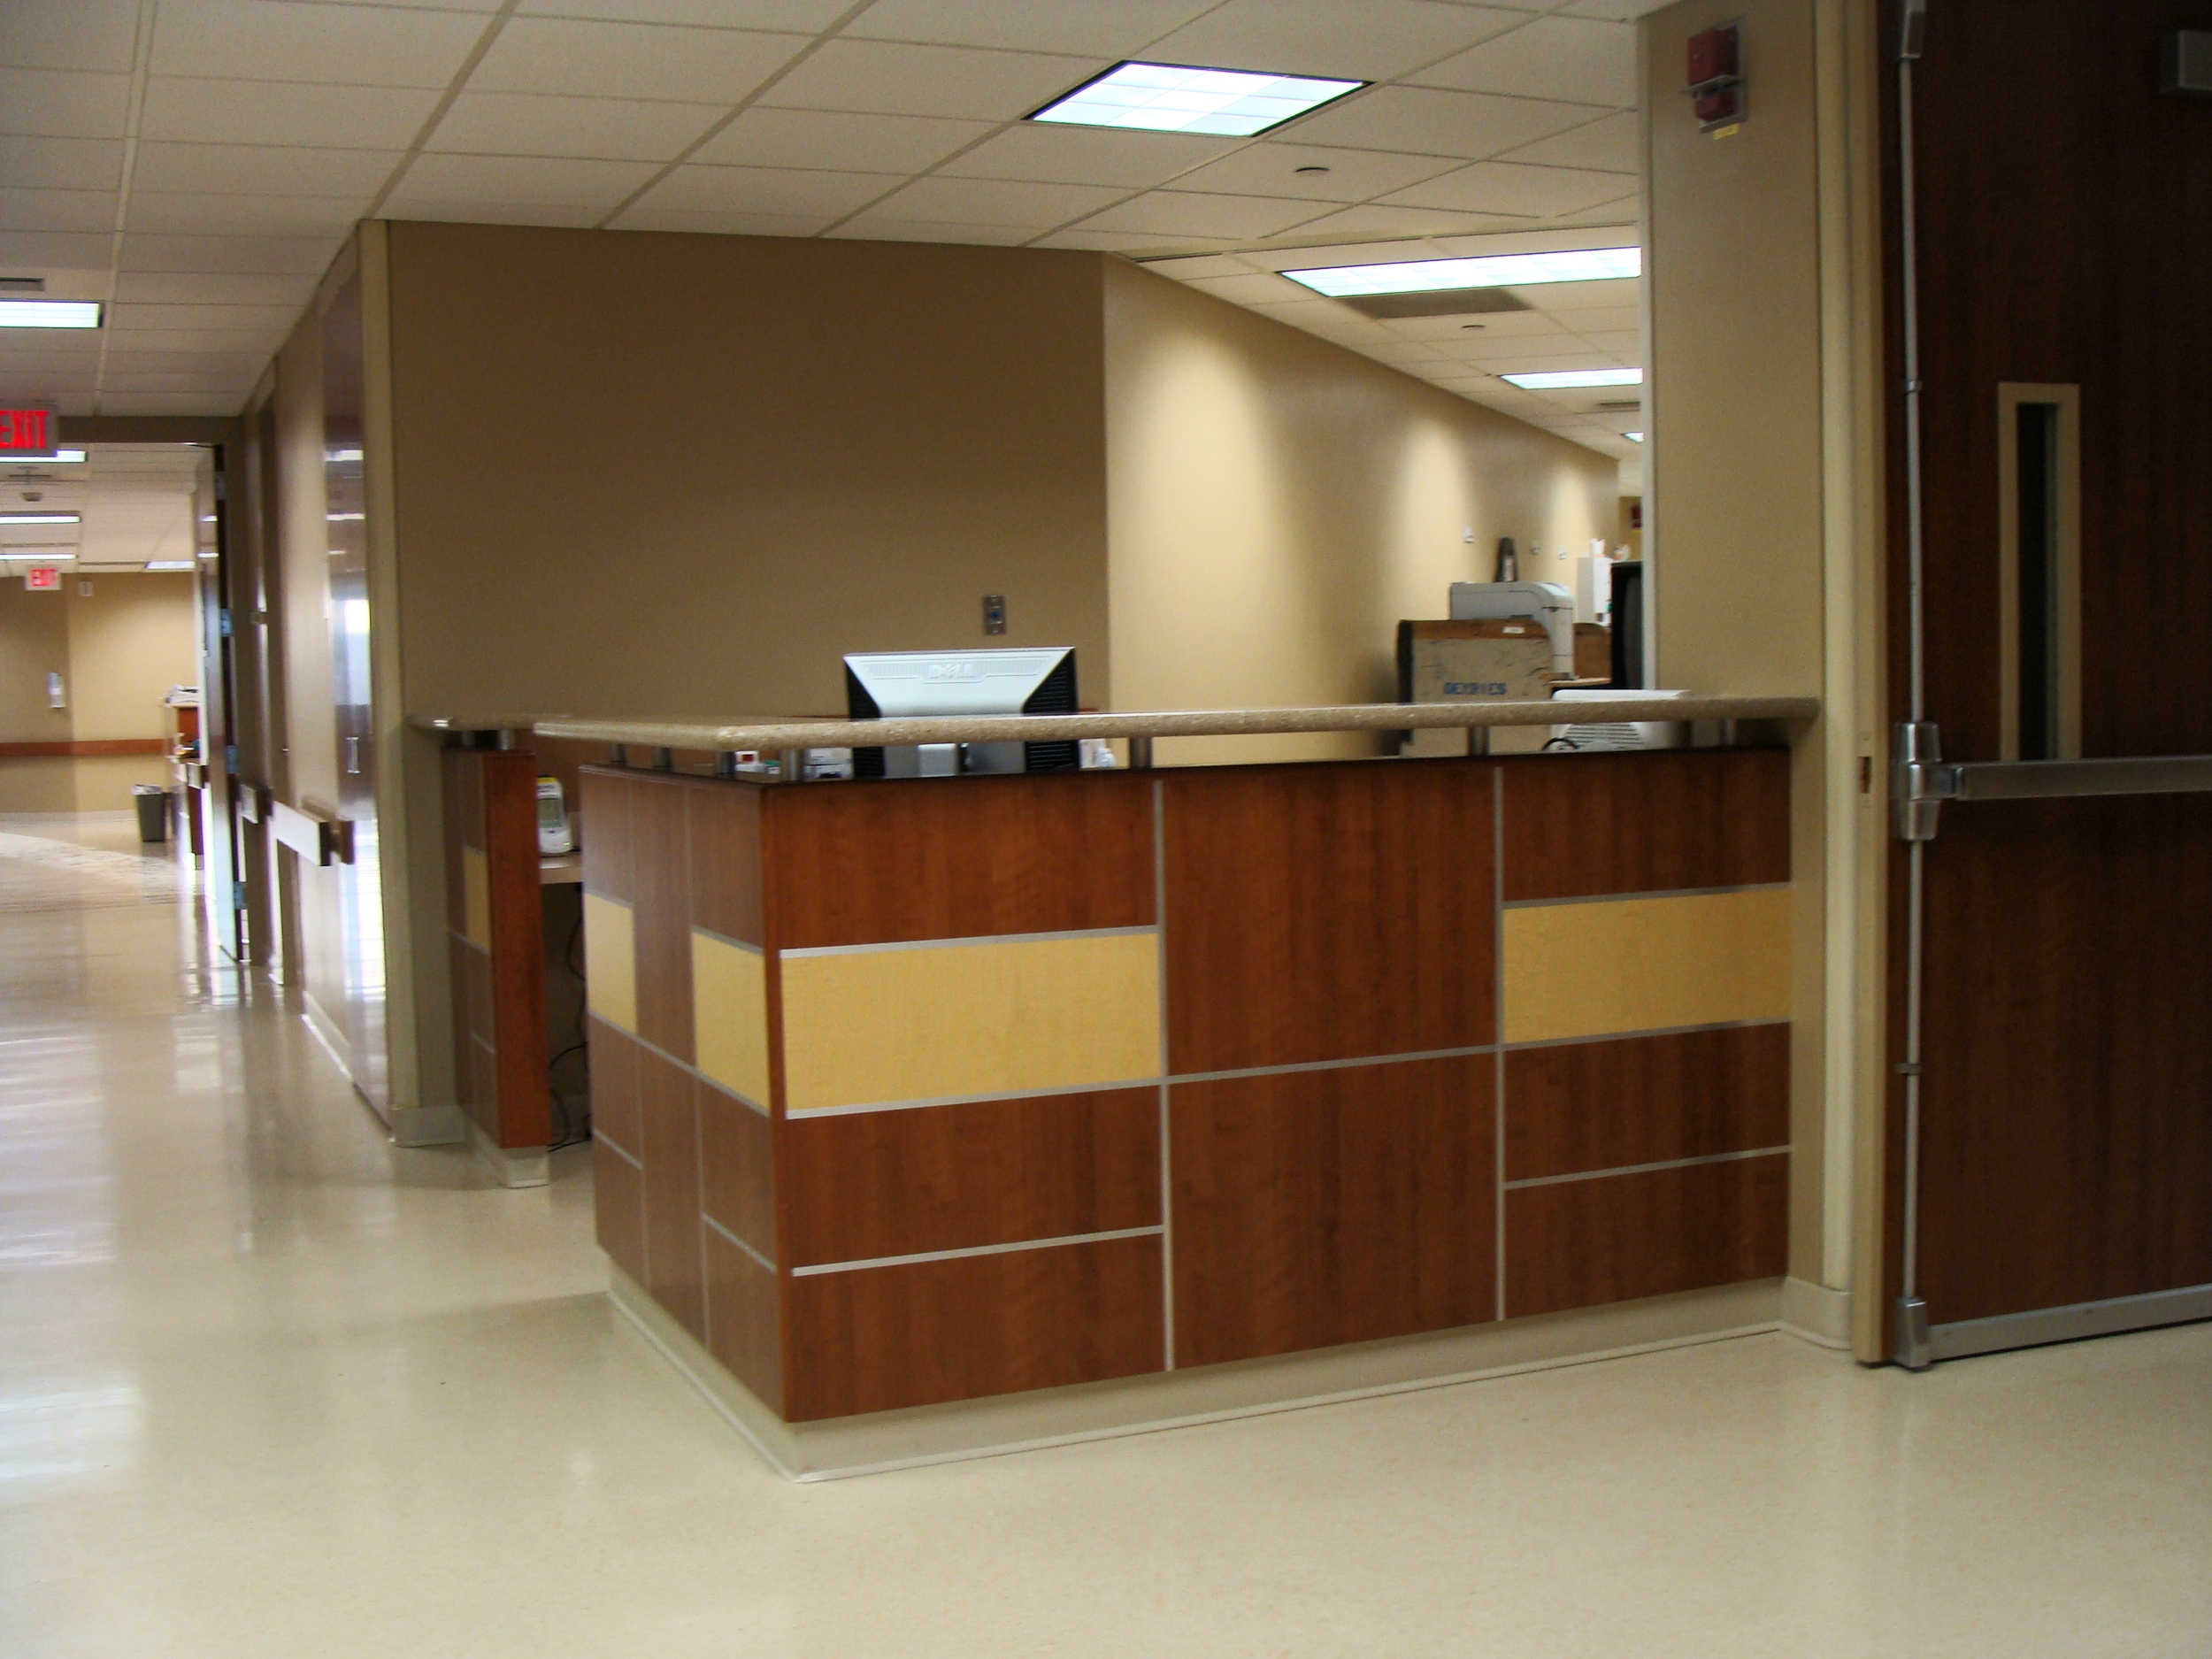 10023 DMC 7th Floor Upgrades Final 03.14.11 003.jpg